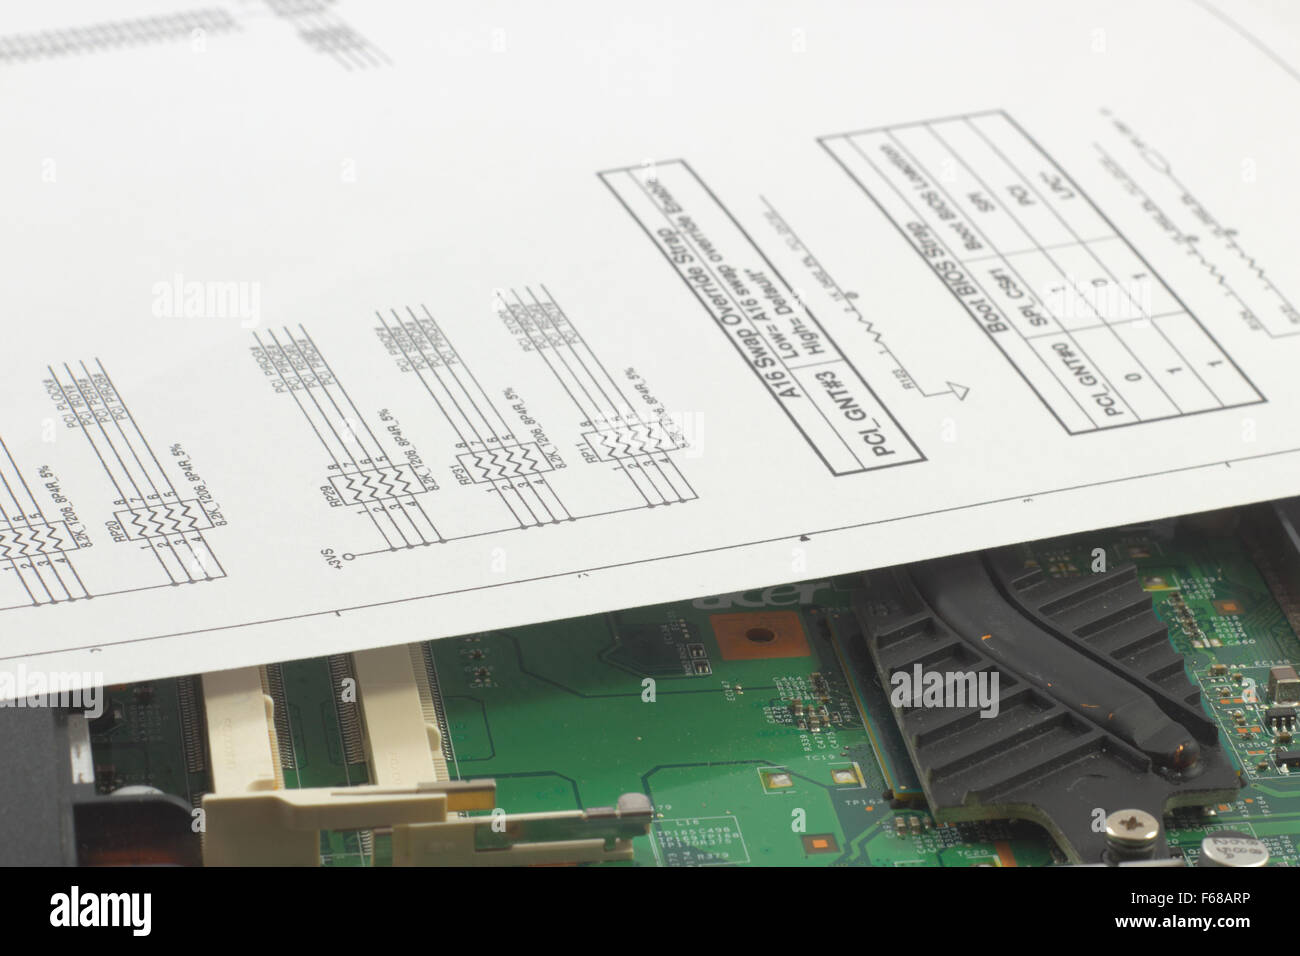 Schemi Elettrici Di Circuiti : Vista dettagliata dei circuiti di un notebook difettoso e relativi